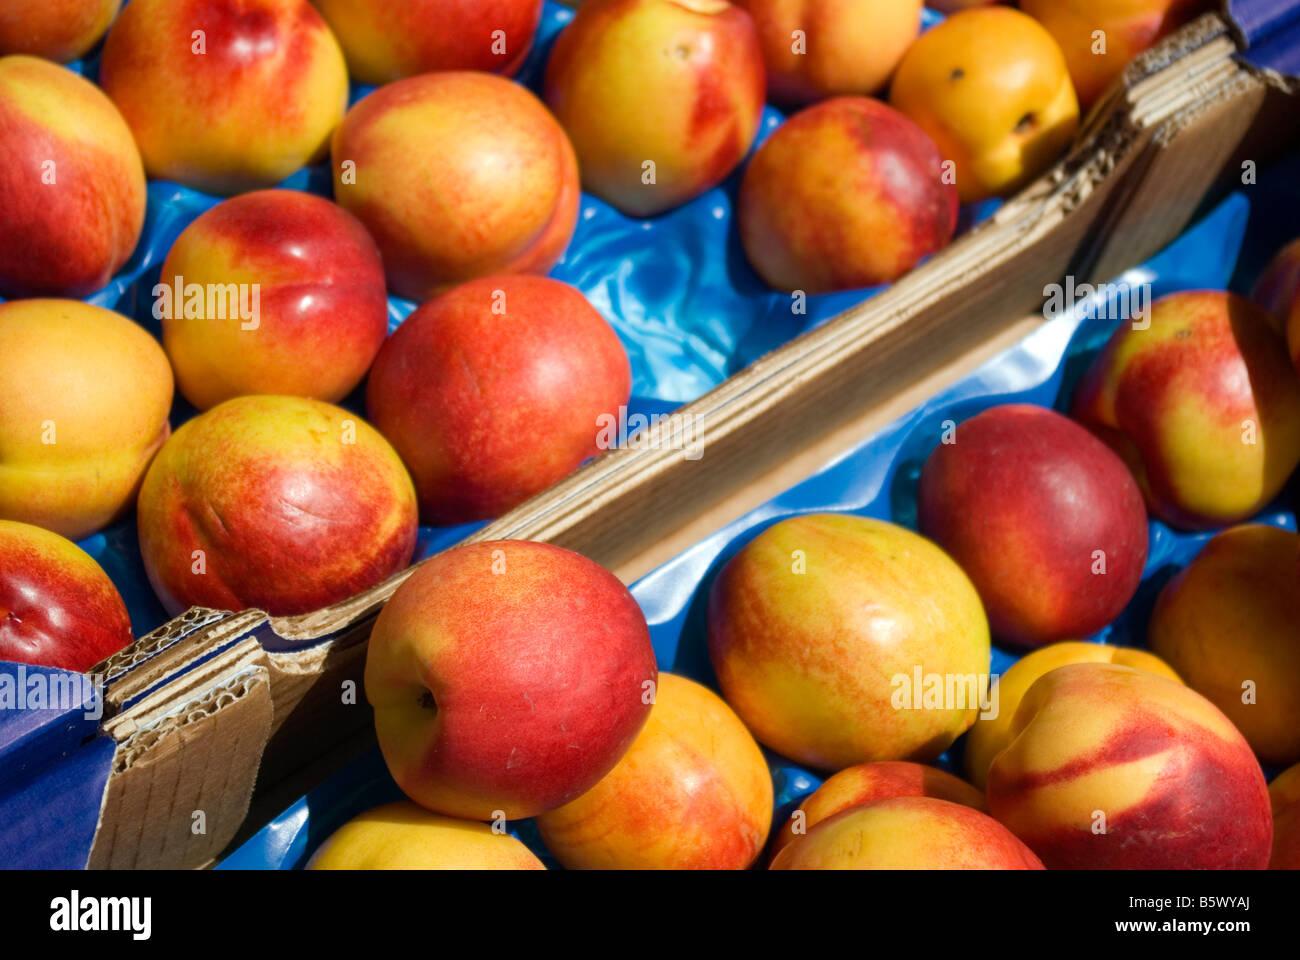 Nectarines displayed in cardboard carton - Stock Image